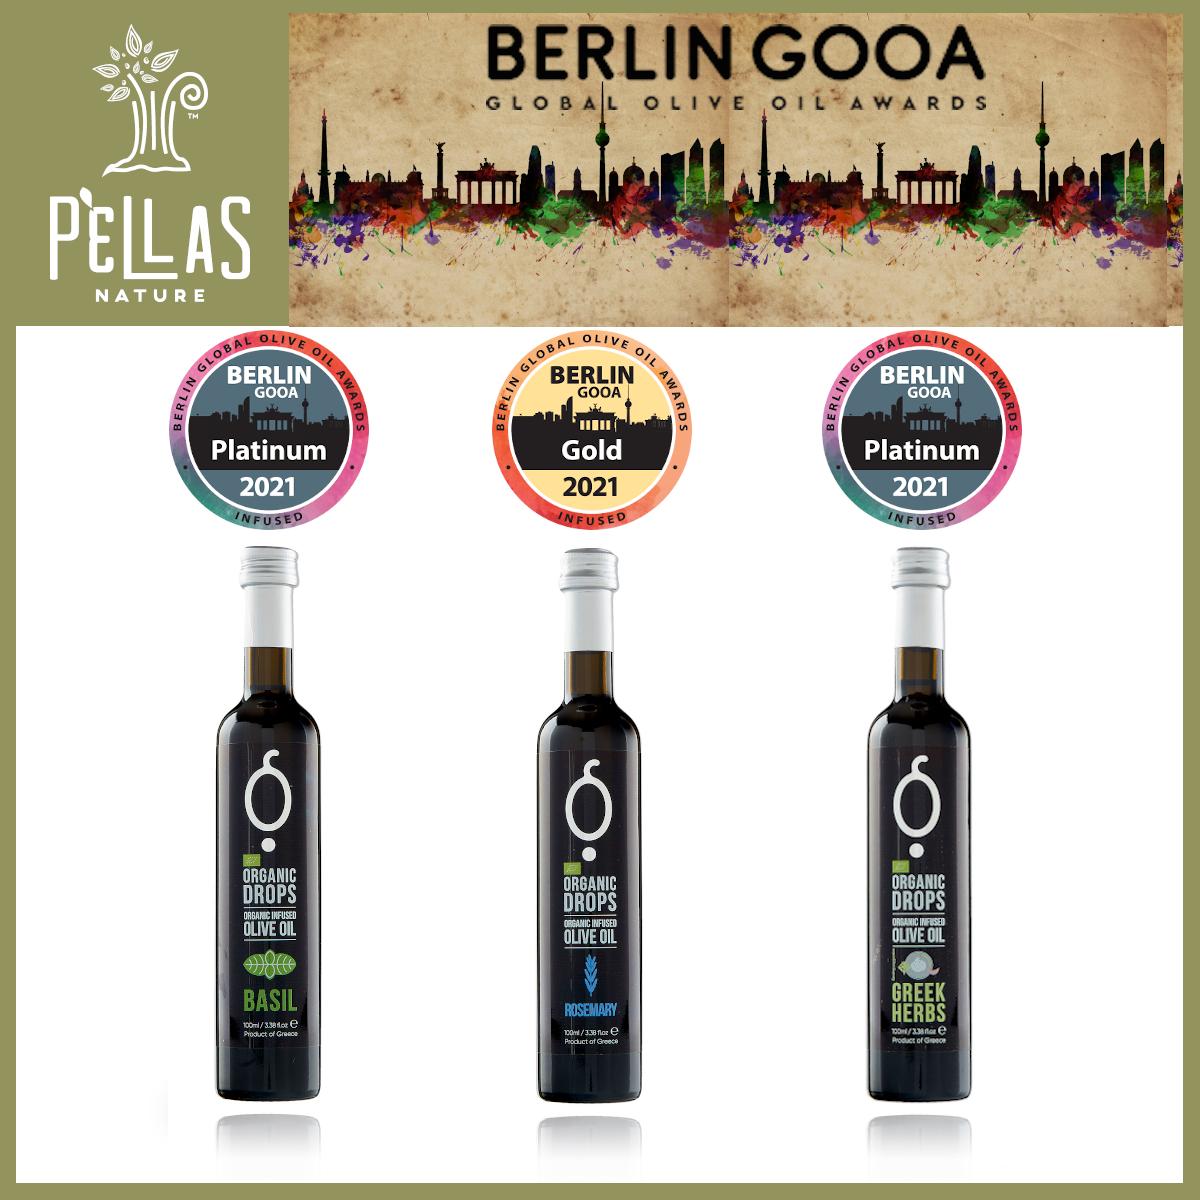 Two Platinum Awards and One Gold Award at Berlin GOOA 2021